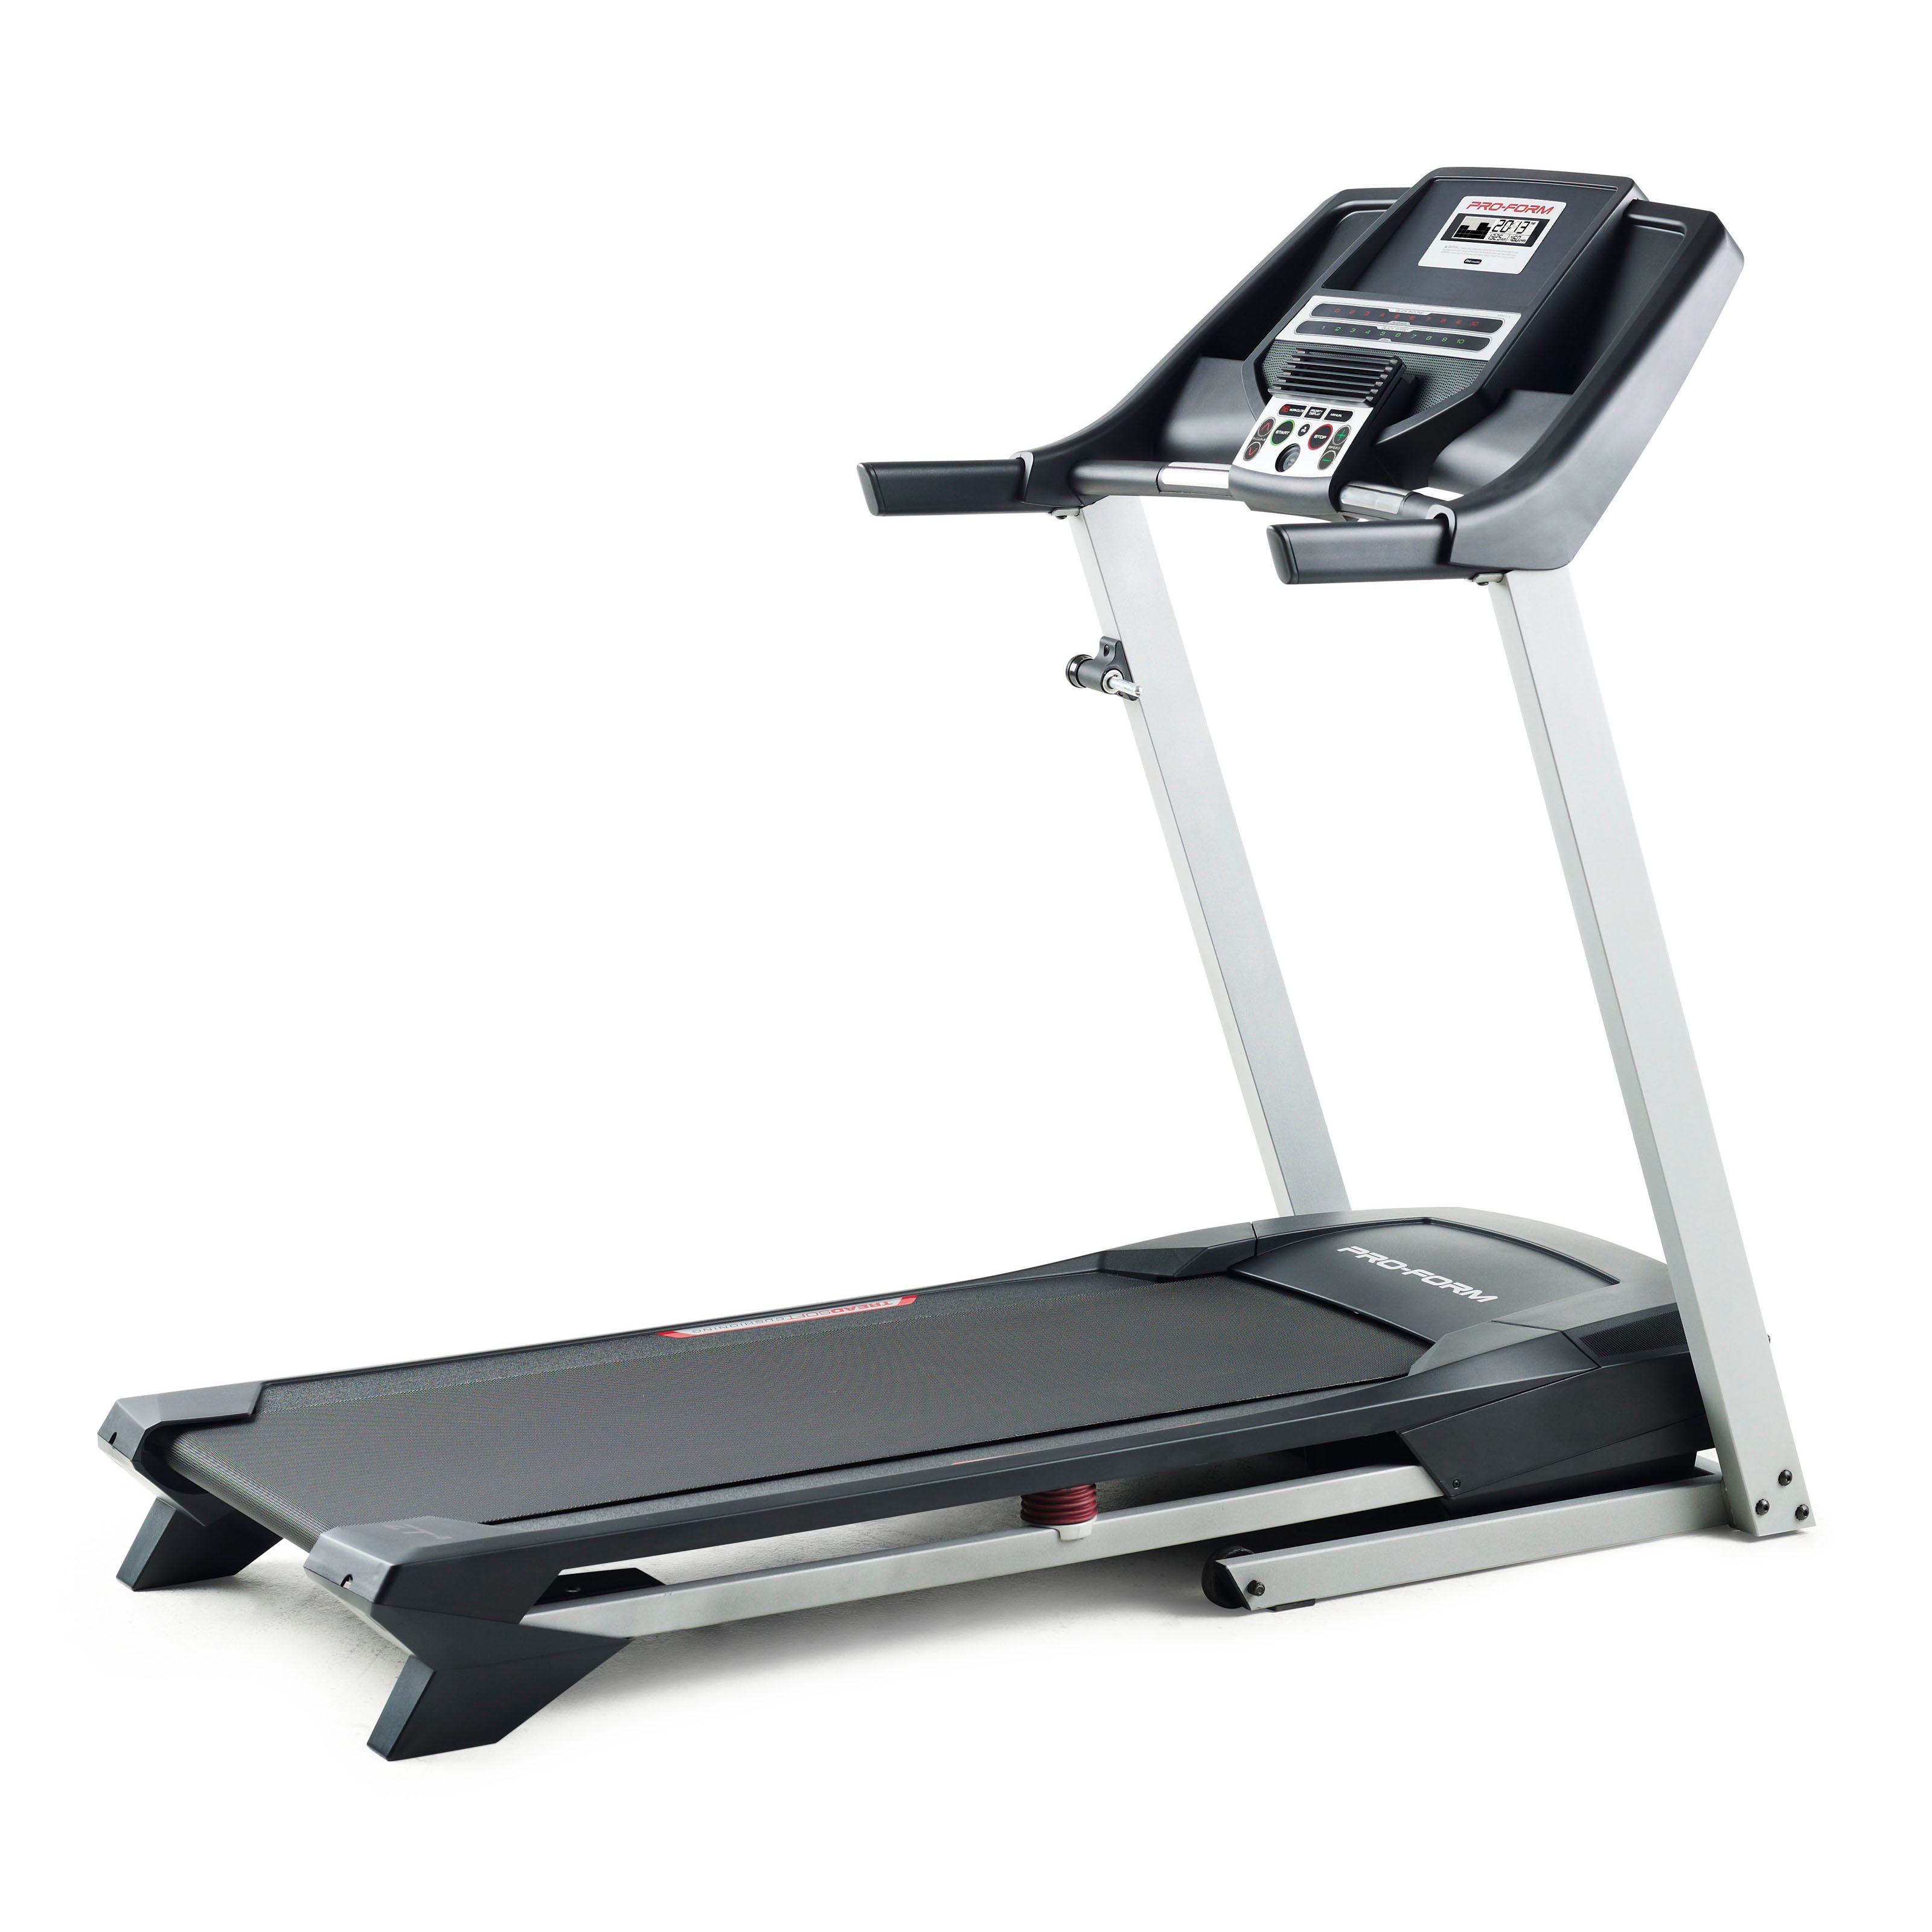 proform zt4 folding treadmill with power incline walmart com rh walmart com Treadmill Proform Personal Trainer Spirit Treadmill 225